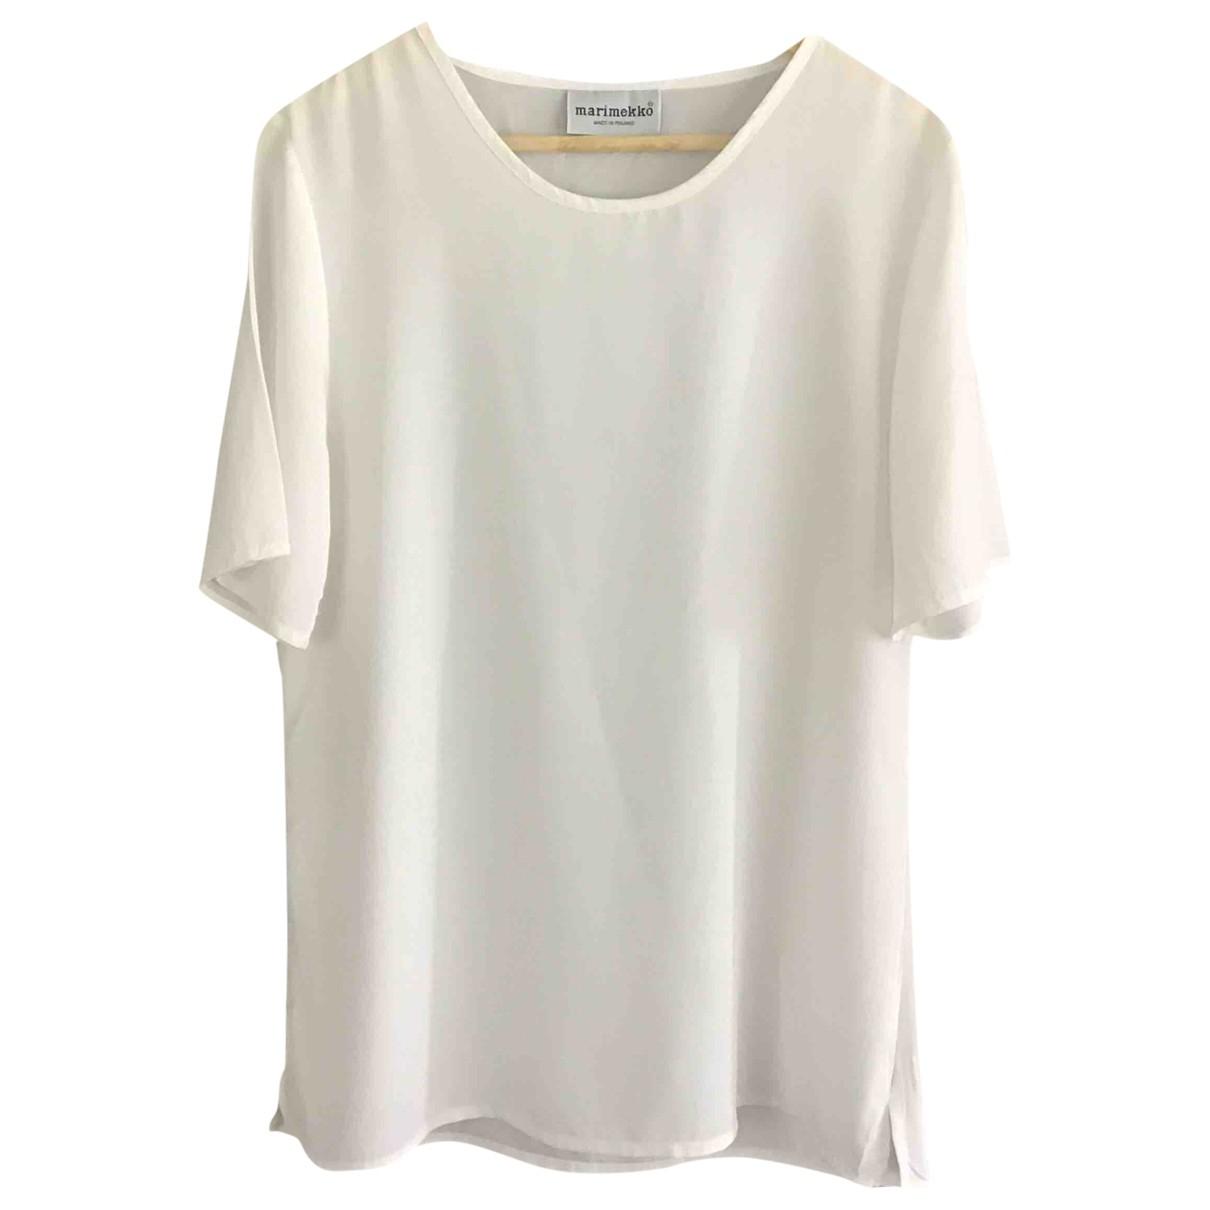 Marimekko - Top   pour femme - blanc